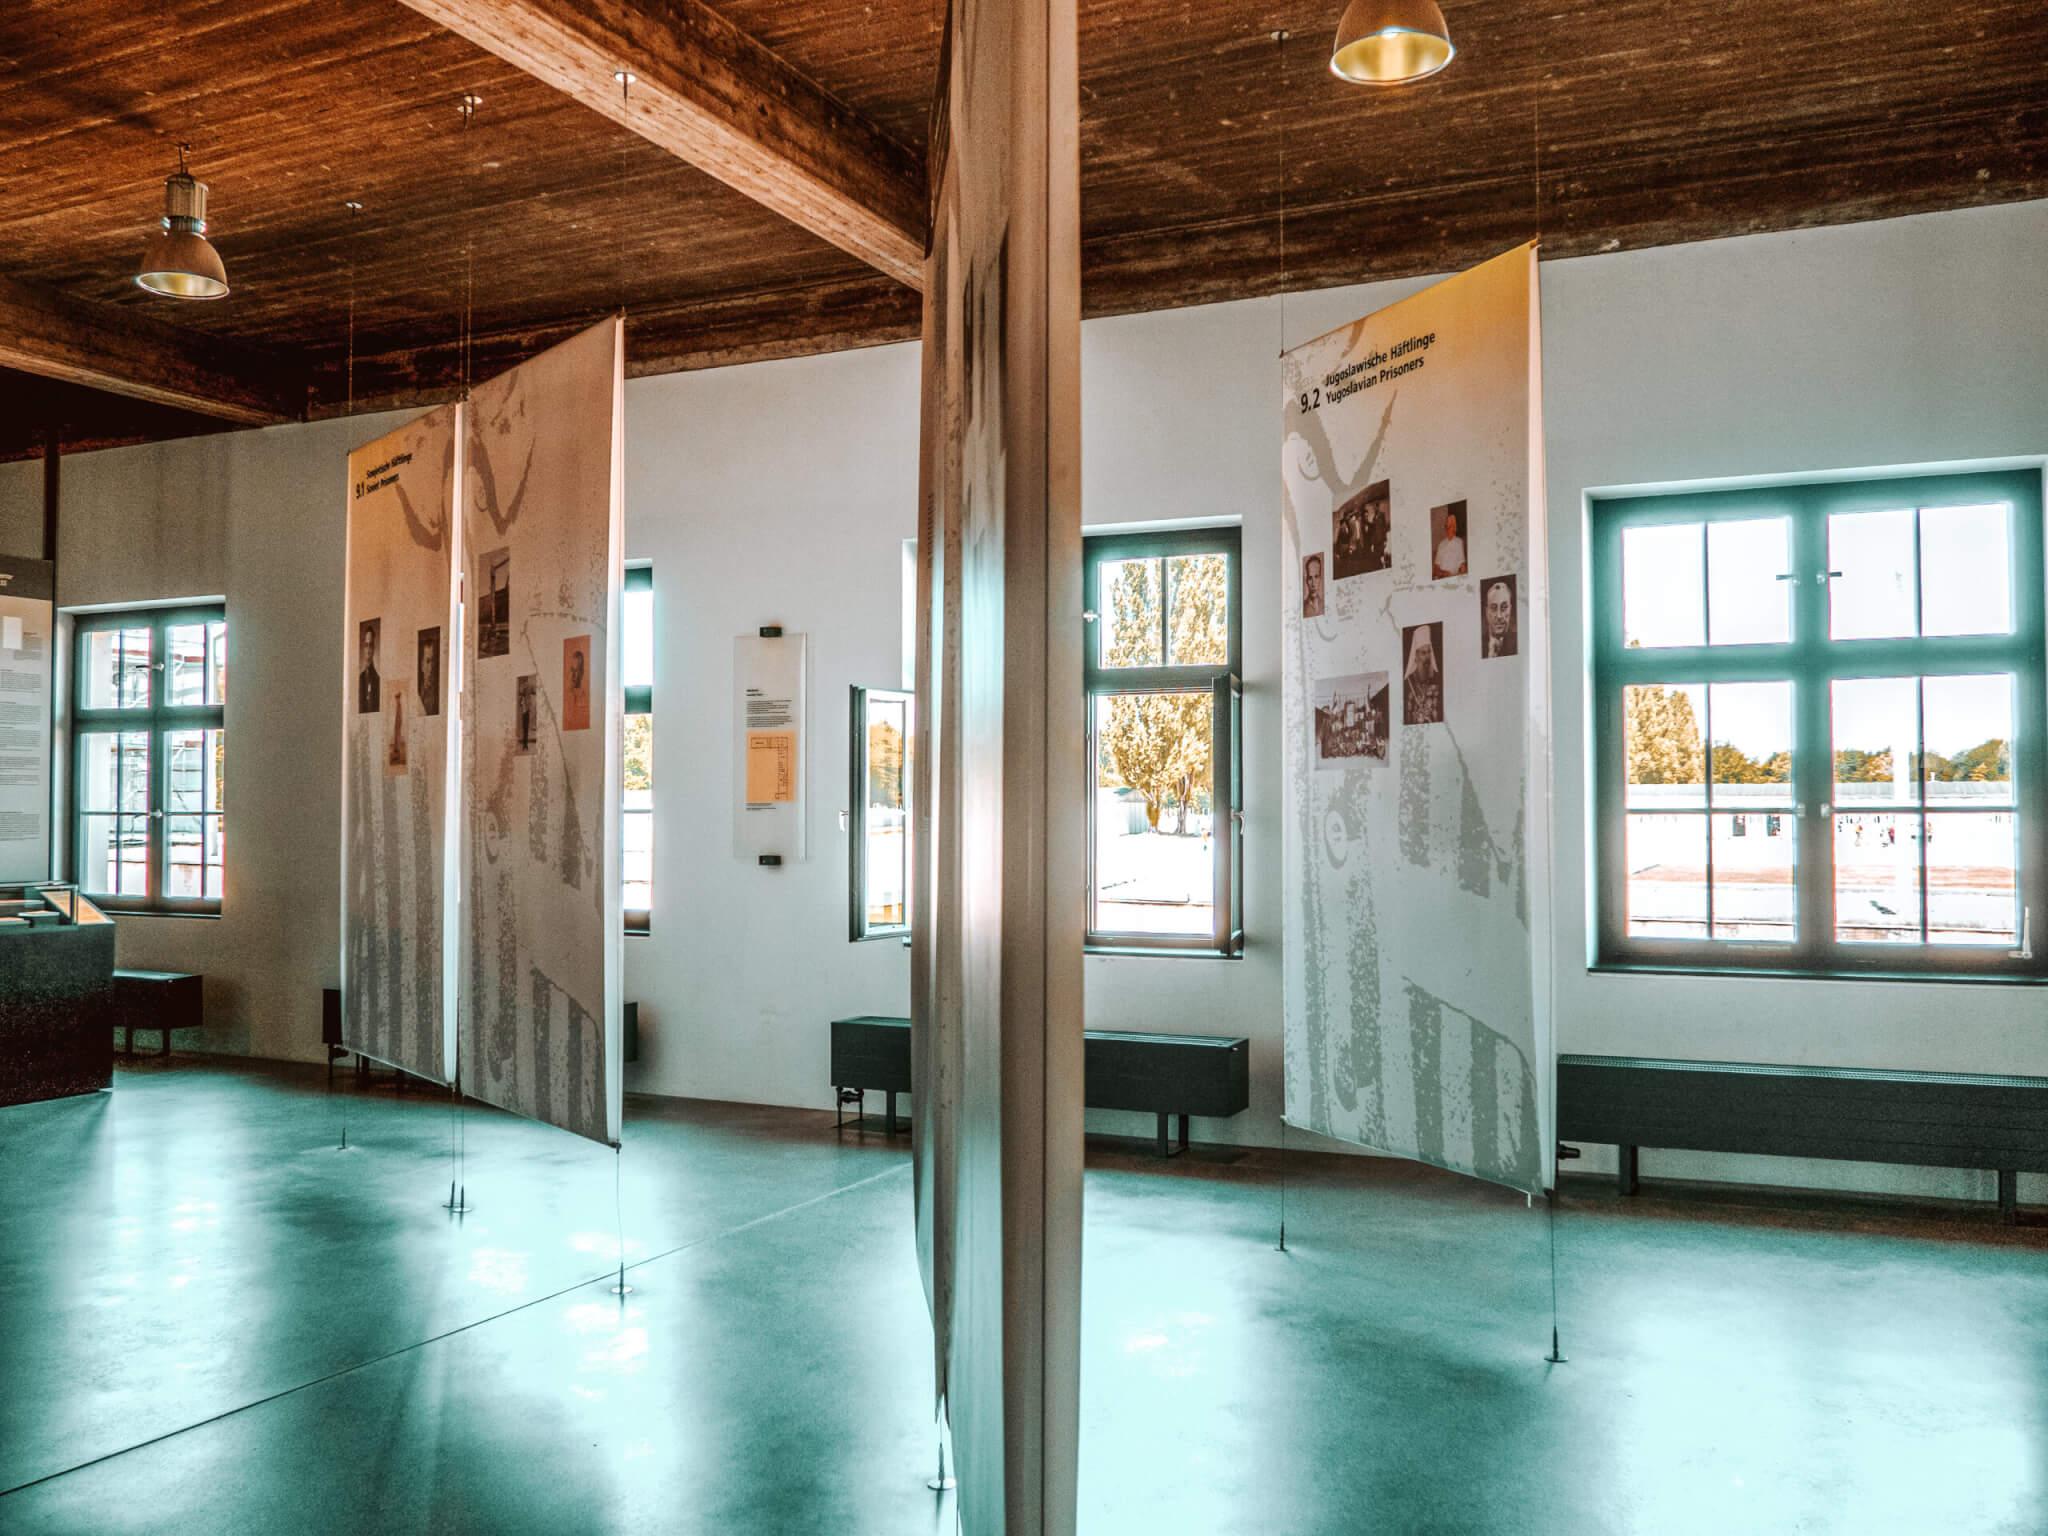 Dachaun keskitysleiri